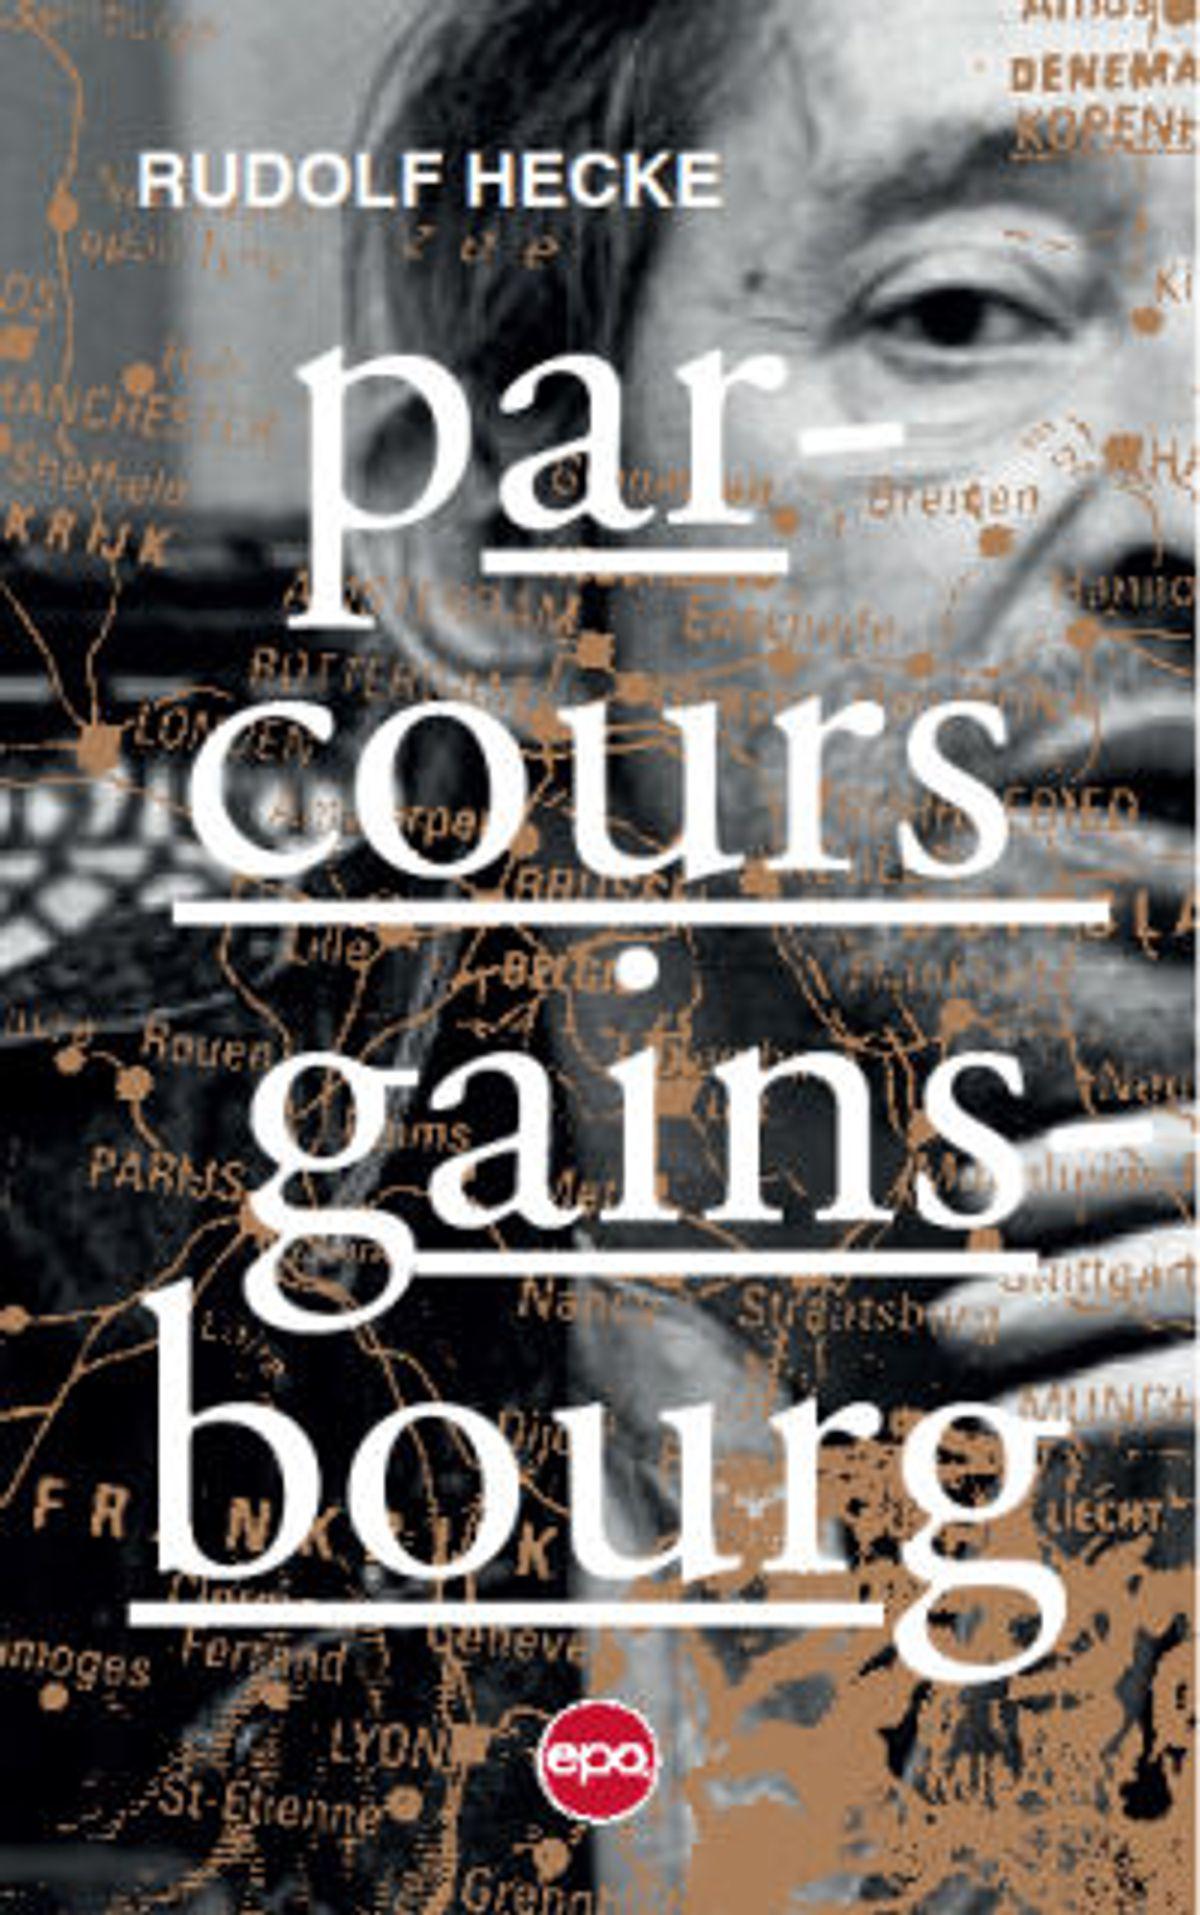 Rudolf Hecke - 'Parcours Gainsbourg'